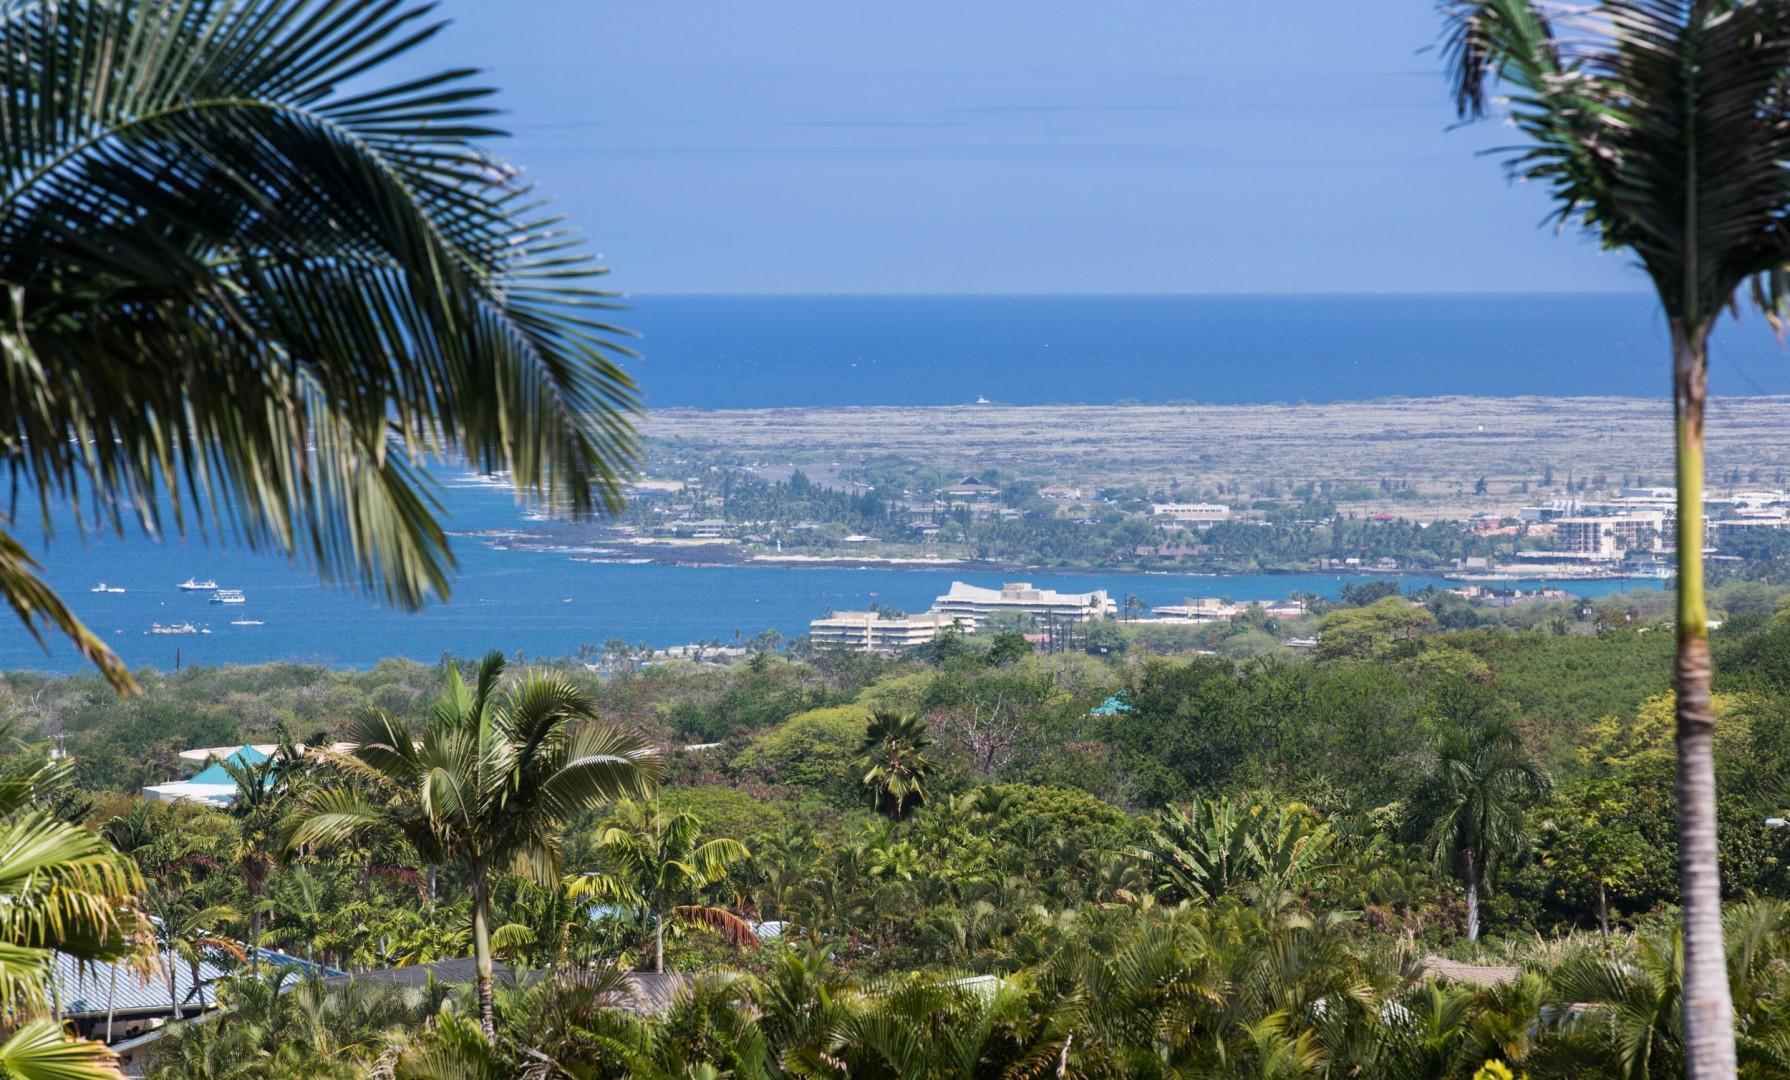 View of downtown Kailua Town from lanai.